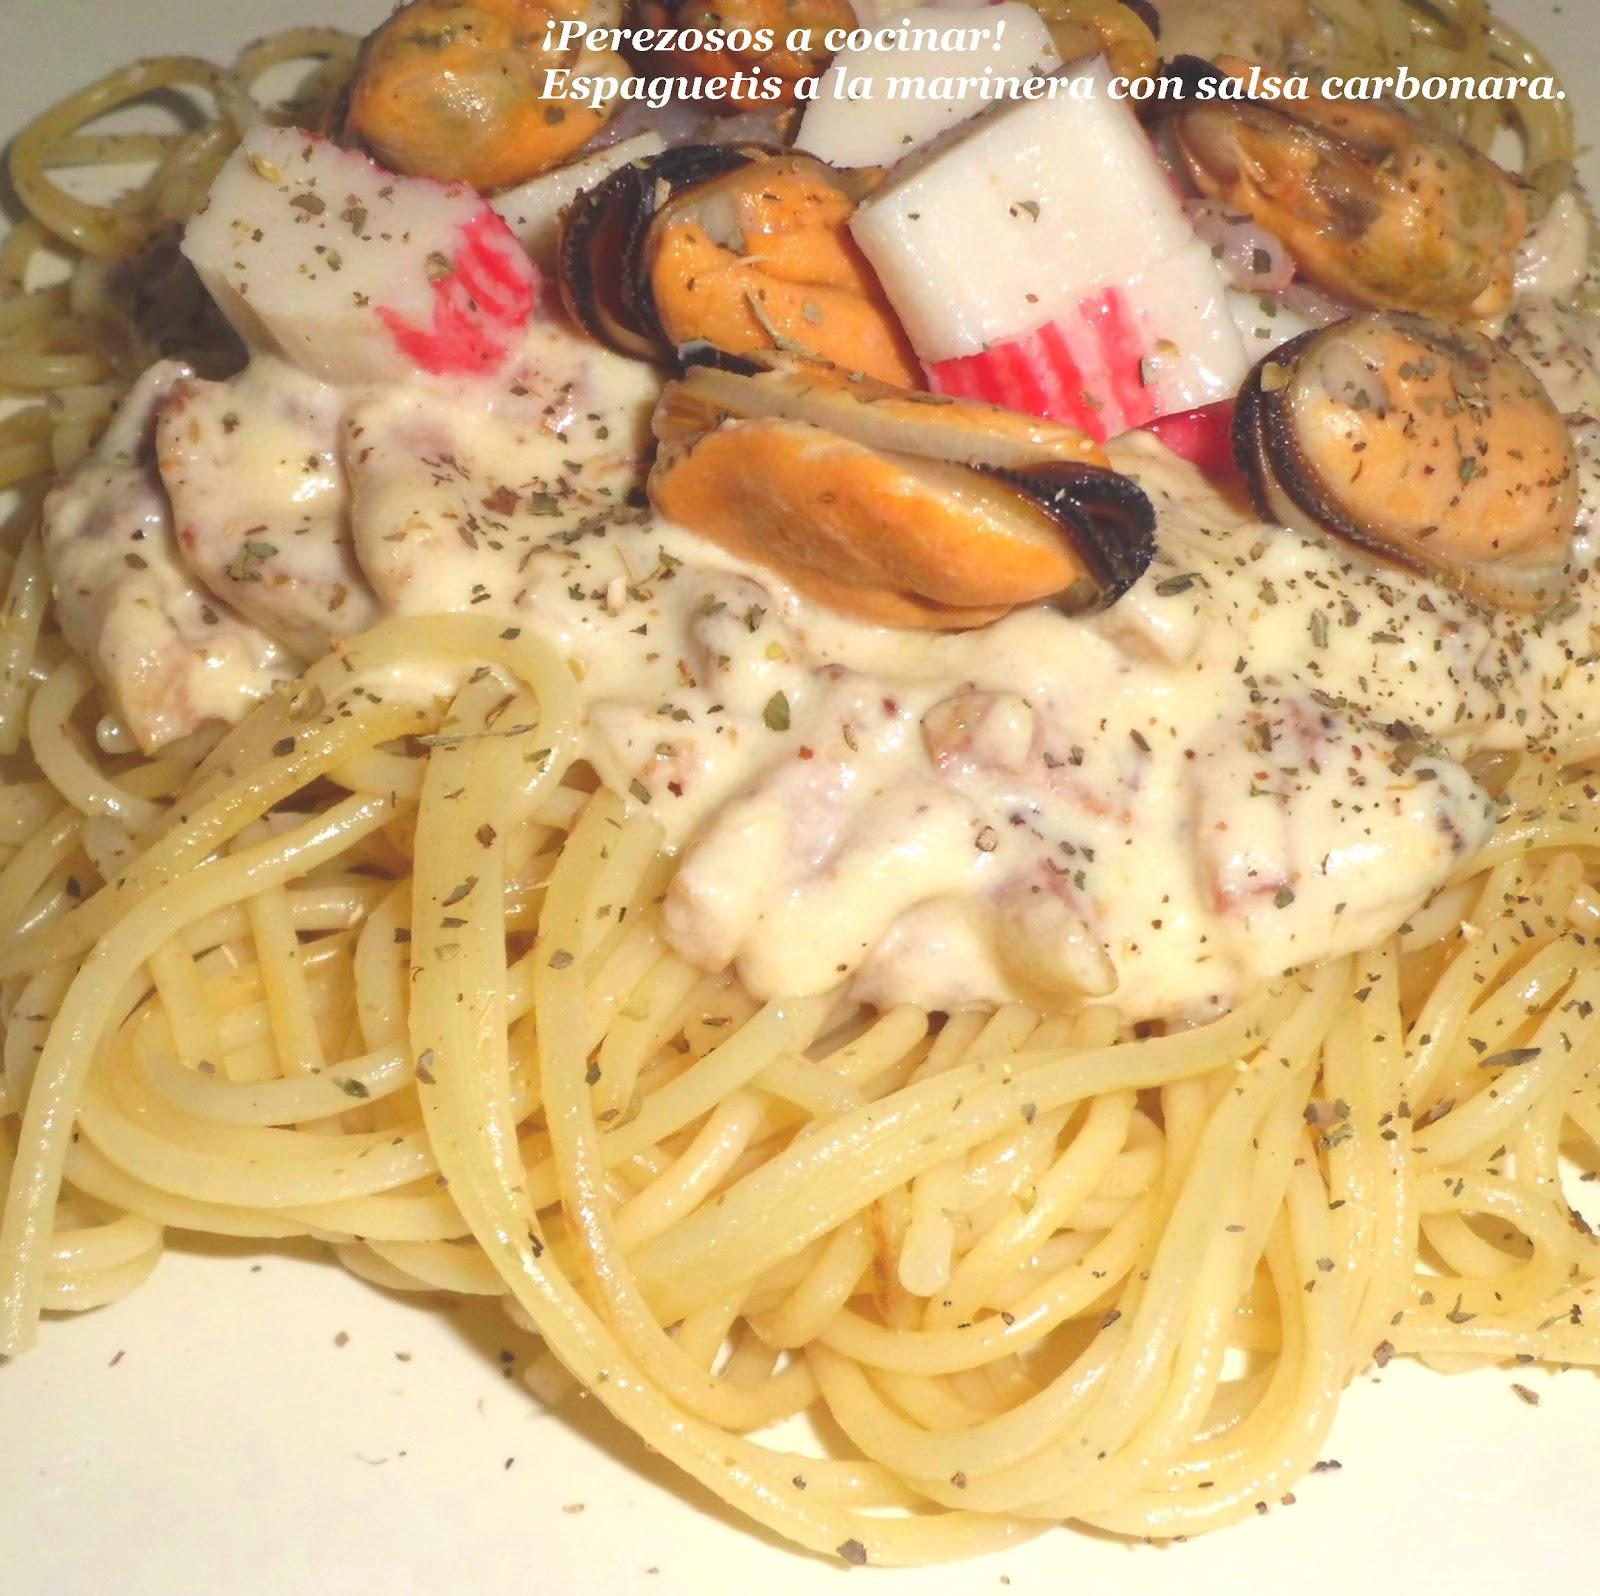 Perezosos a cocinar espaguetis a la marinera con salsa for Hacer salsa marinera